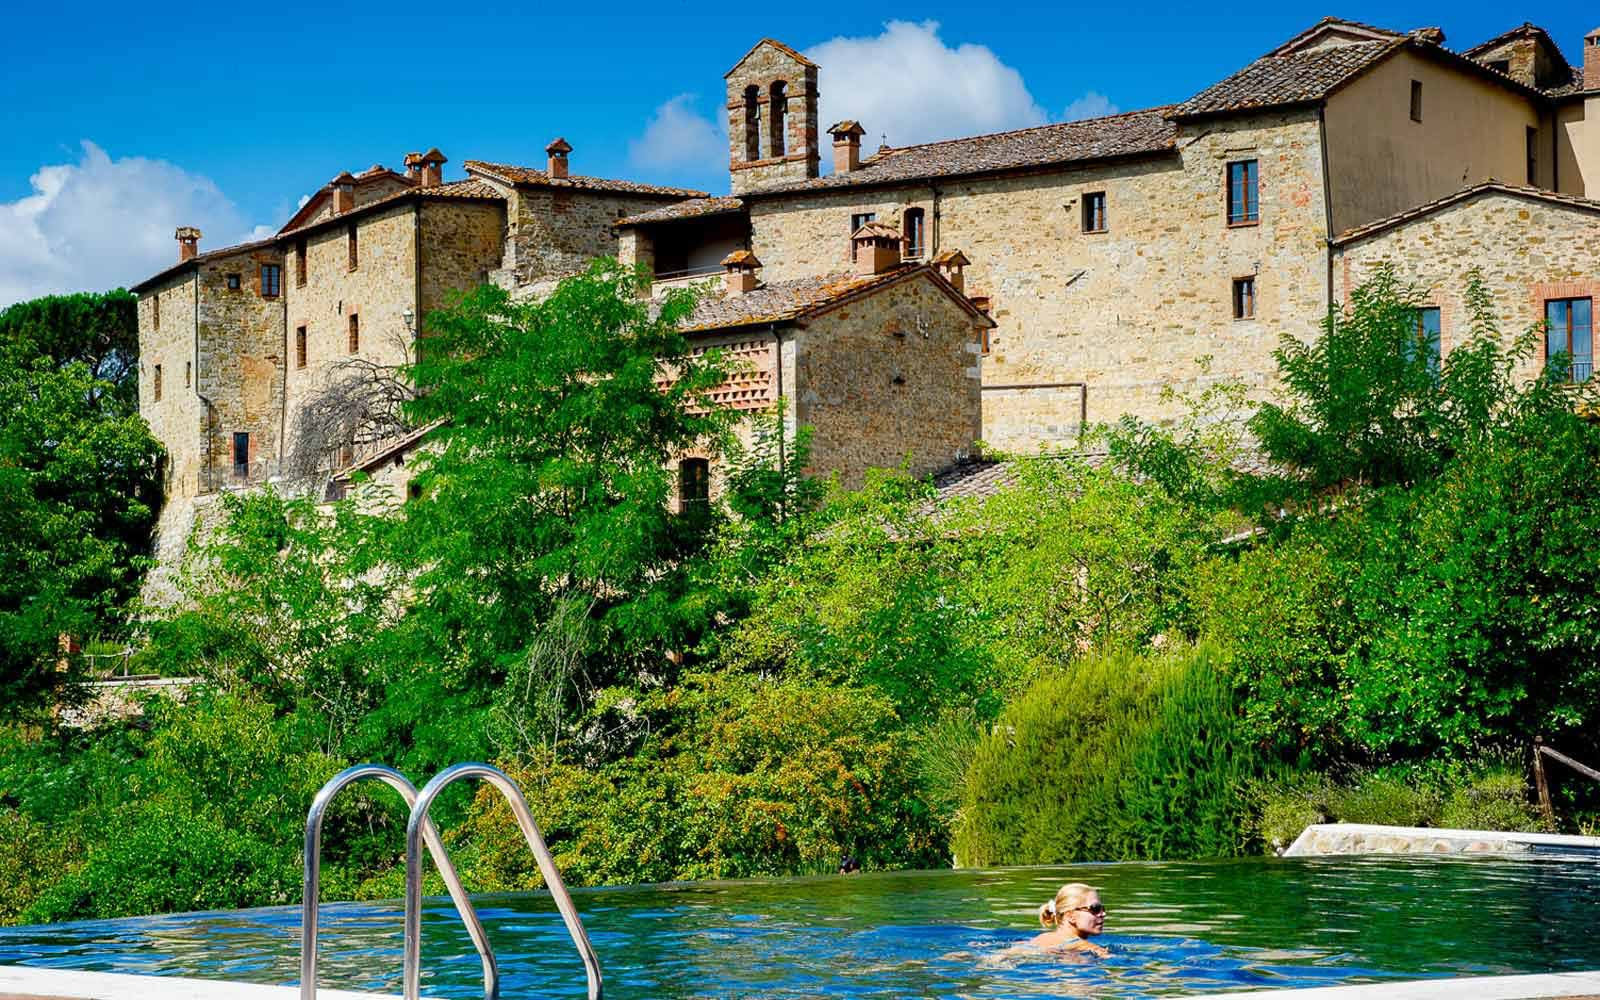 Castel Monastero Tuscan Retreat & Spa